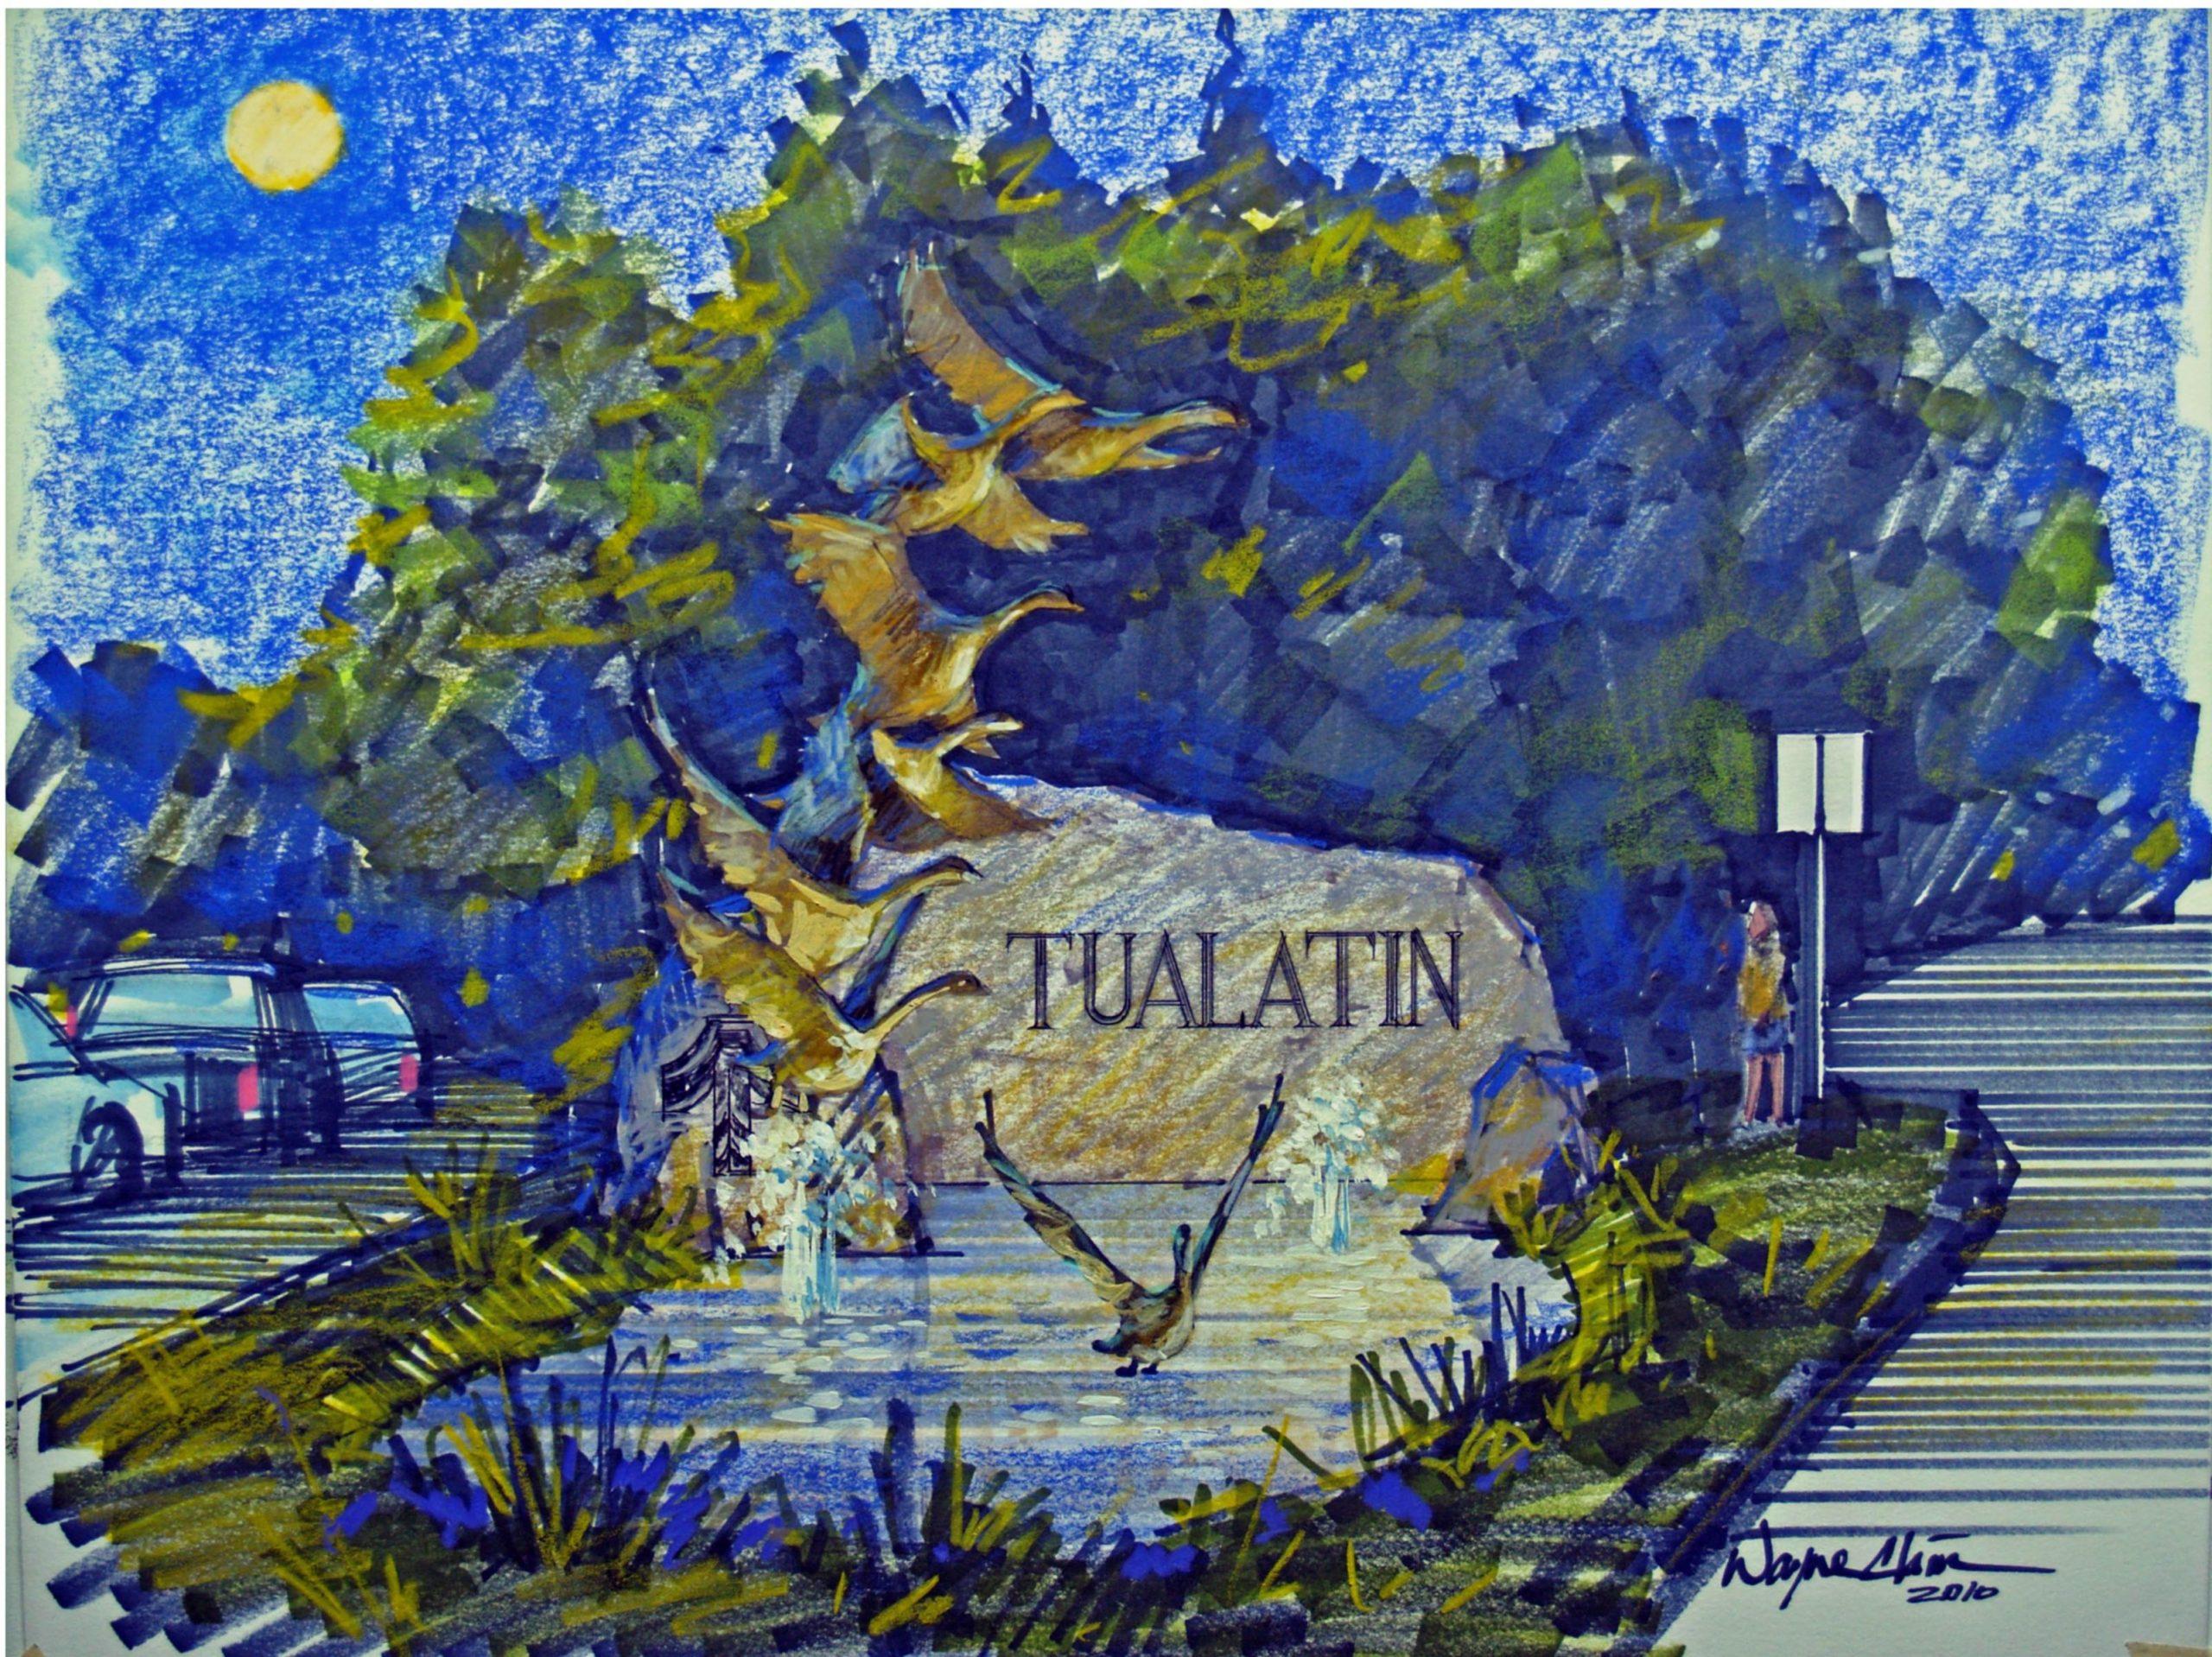 Tualatin Gateway Art Monument